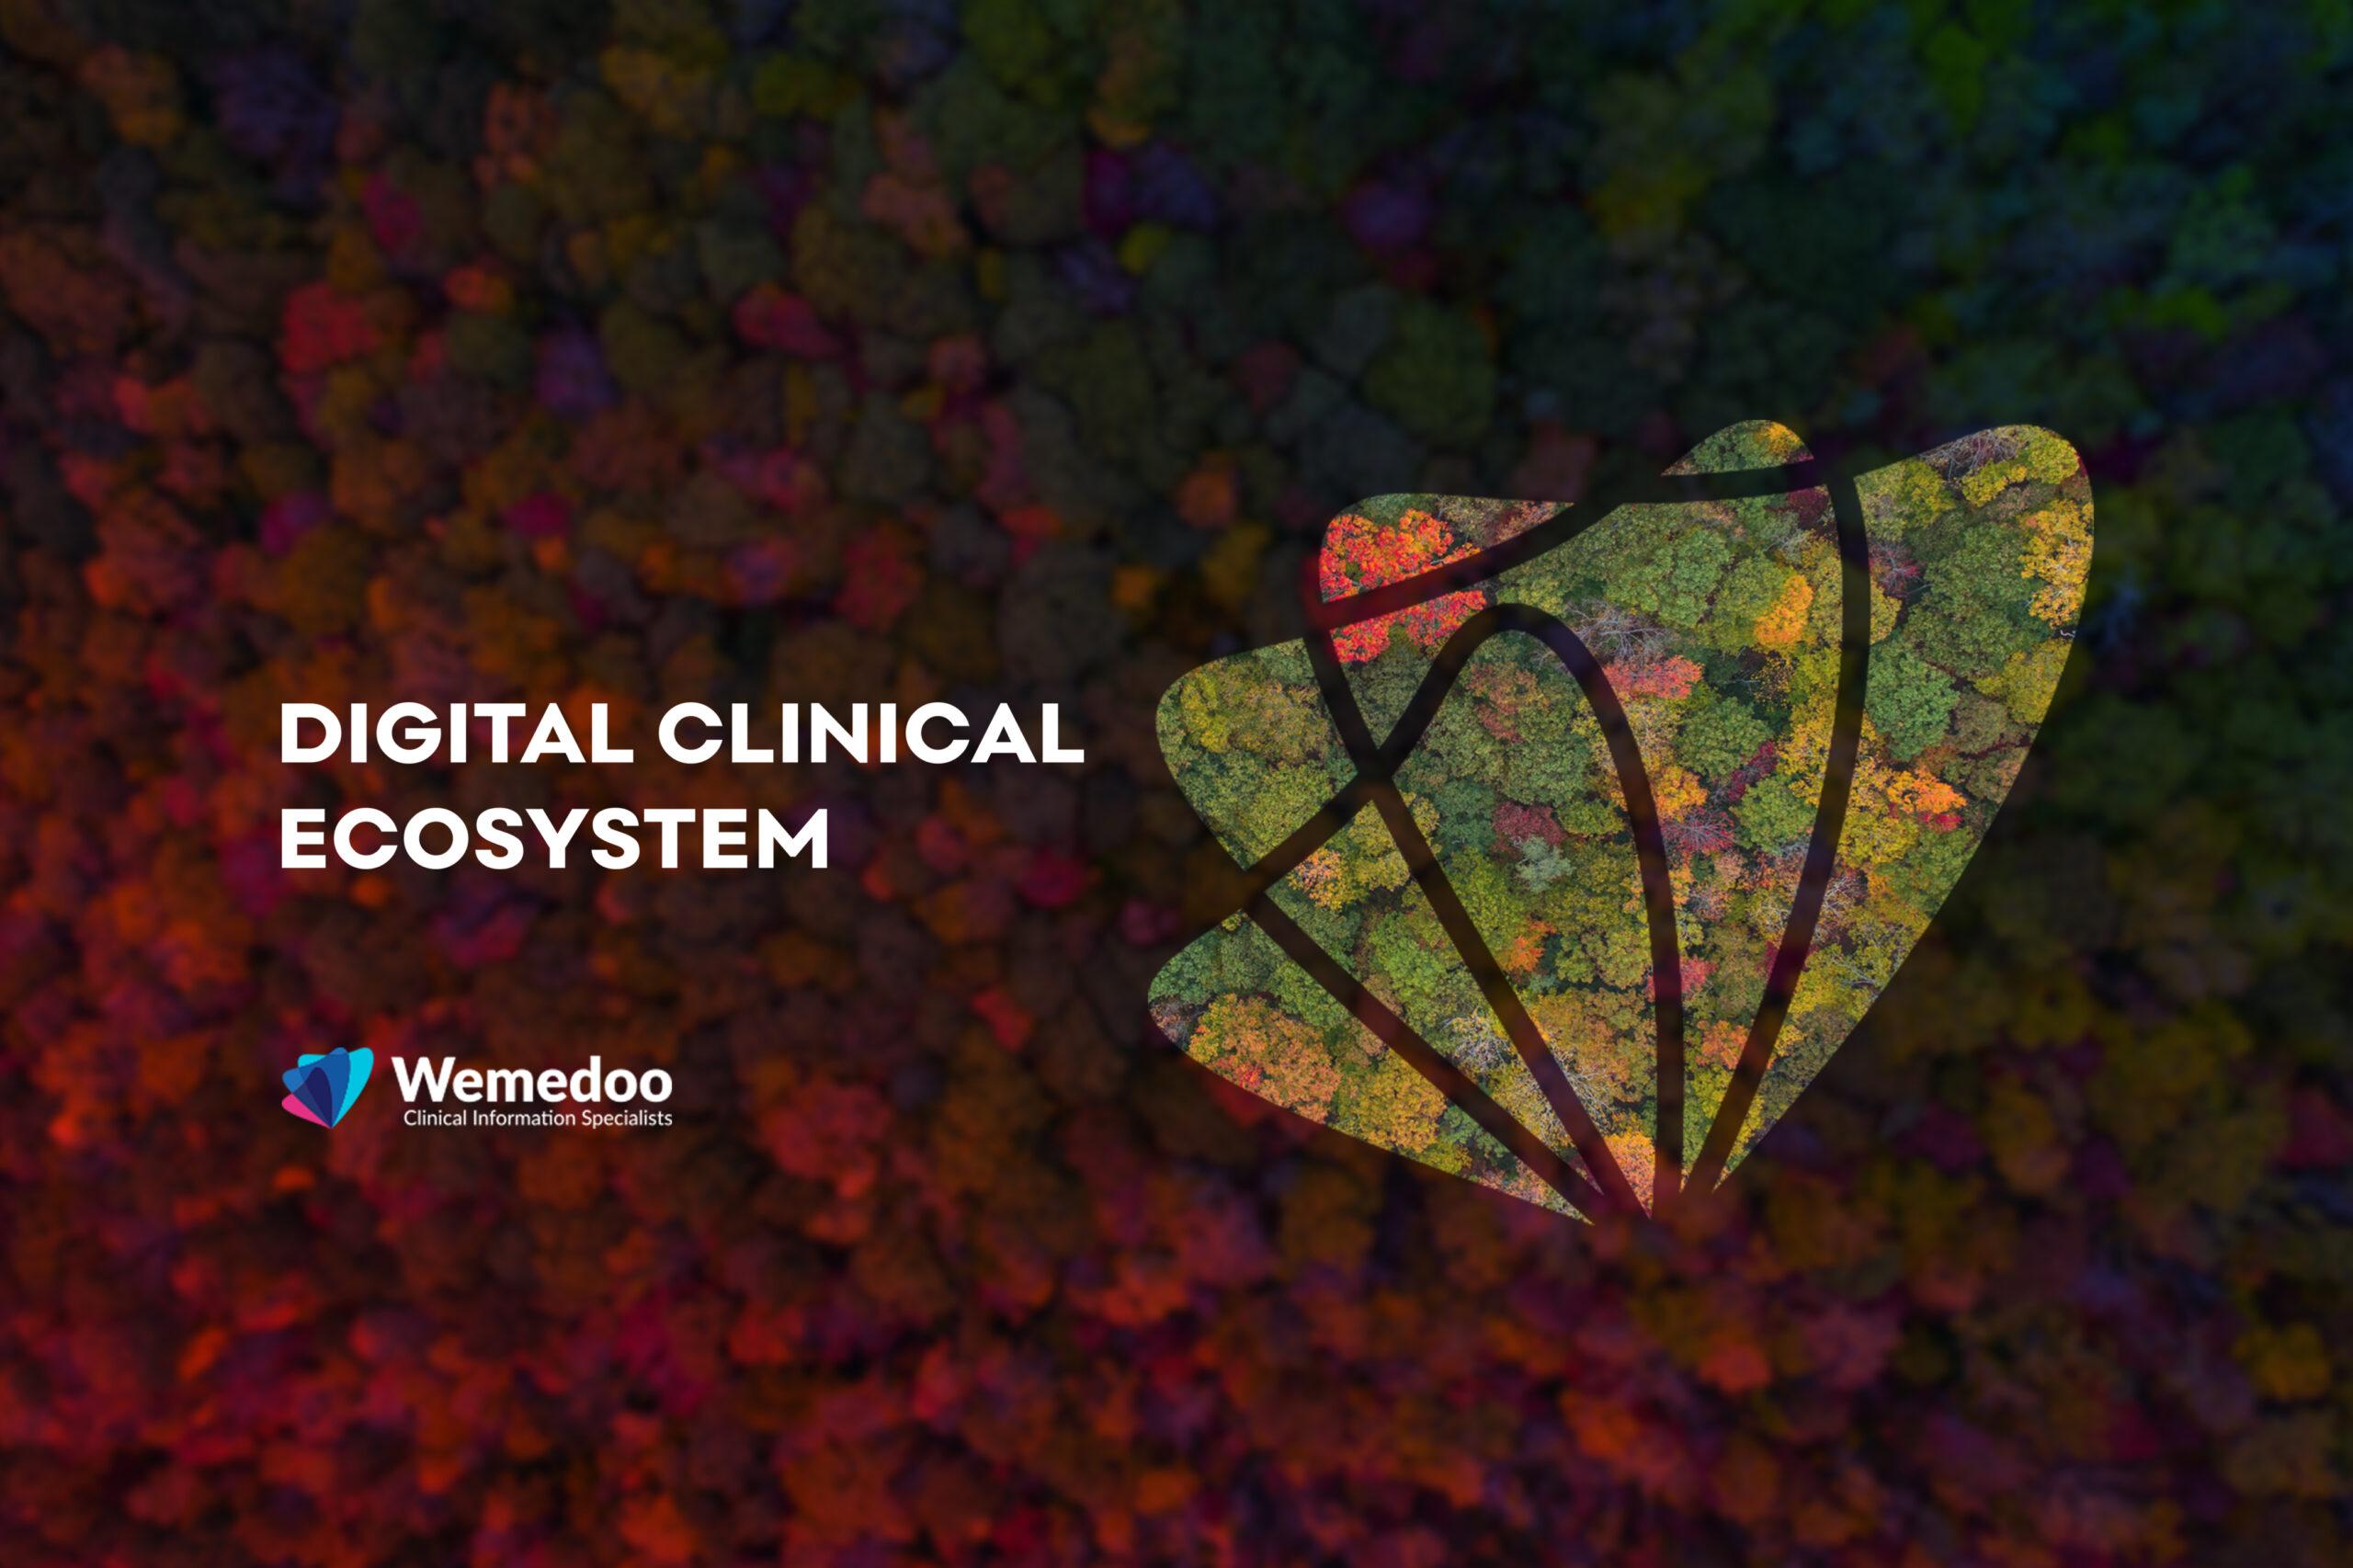 Healthcare Innovation Through a Digital Ecosystem